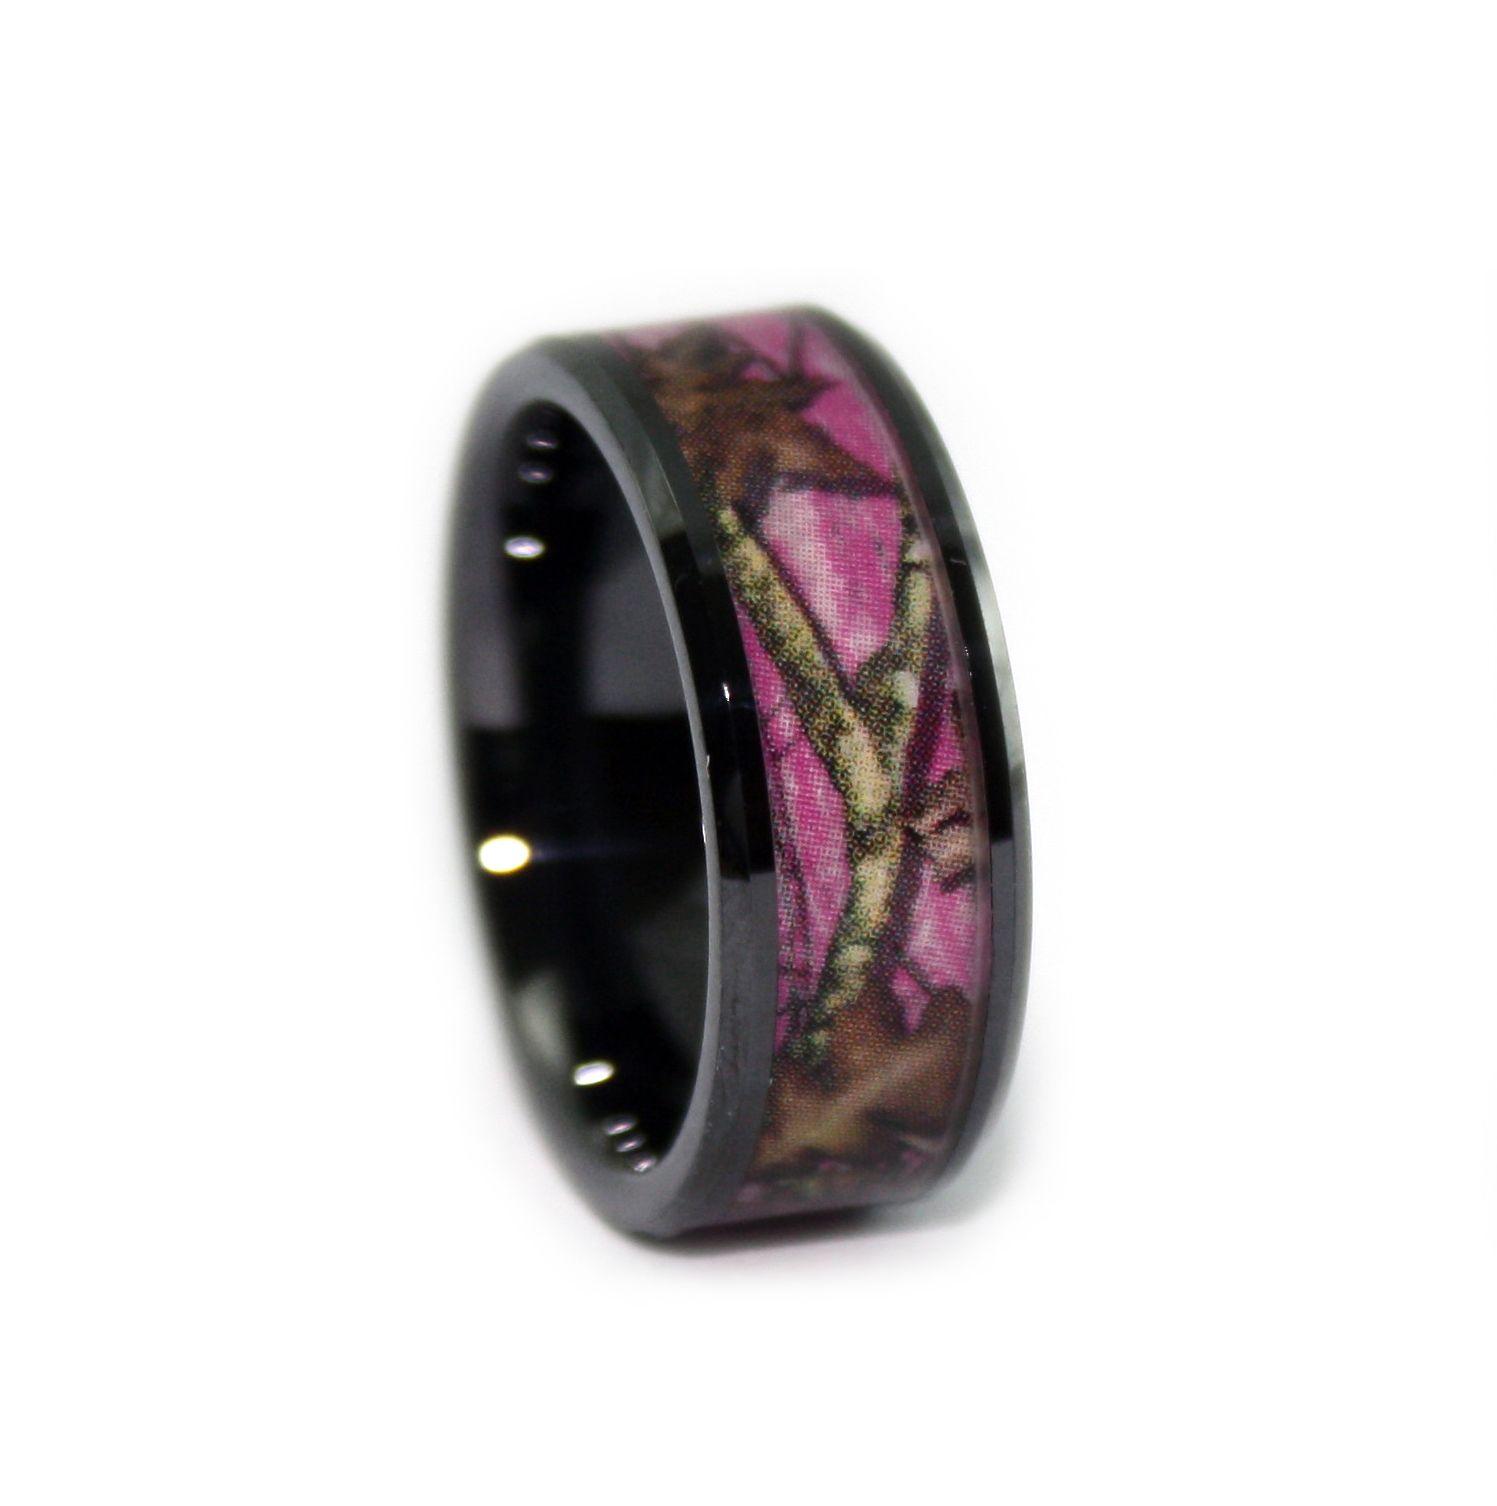 1 Camo Wedding Rings & Camouflage Gear - ONECAMO.com | Pink mossy ...